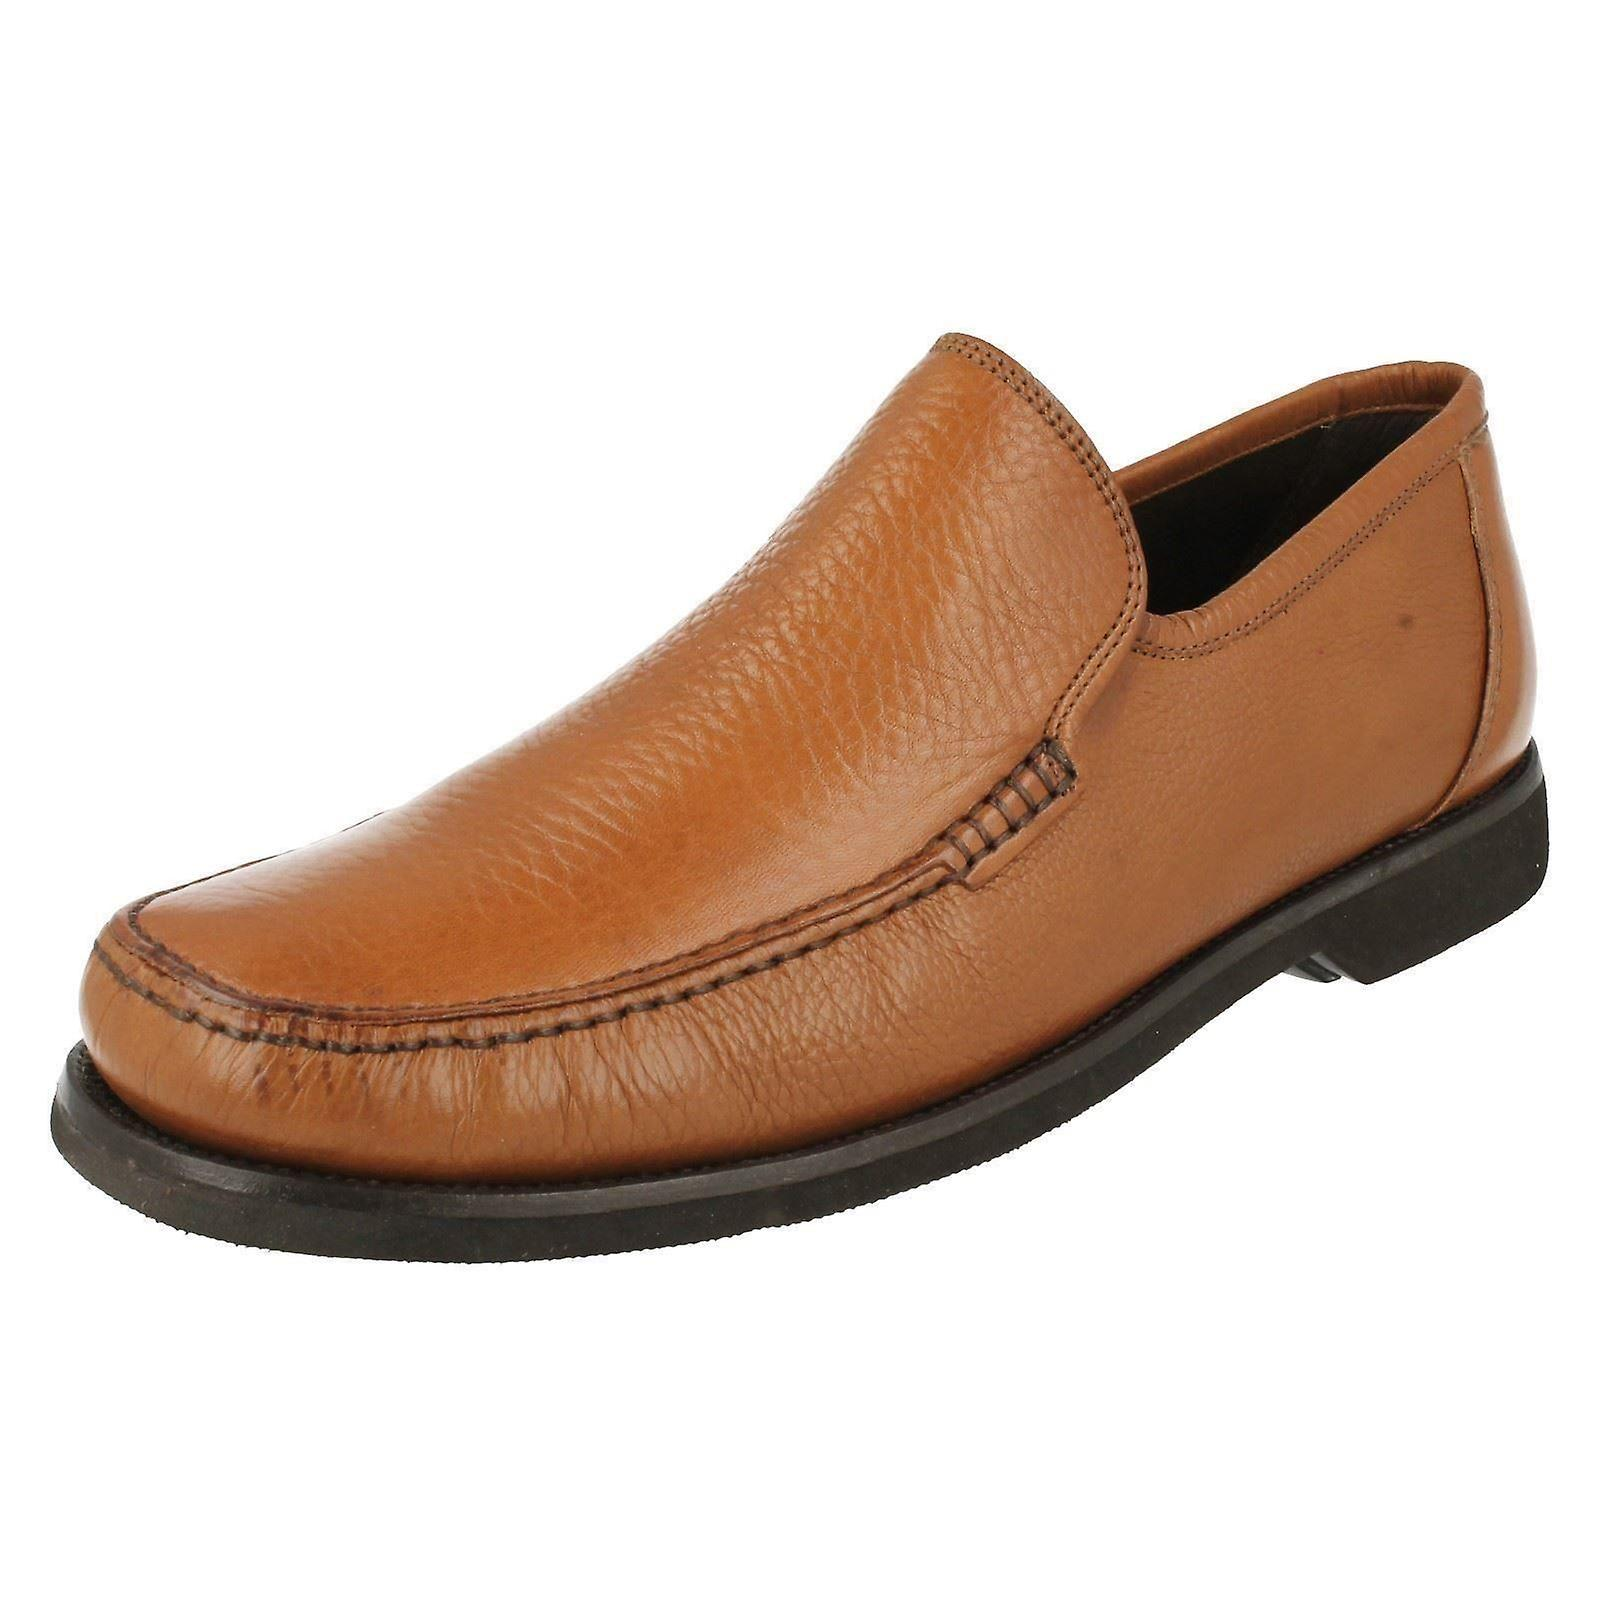 Mens Anatomic Smart Moccasin Shoes Angra